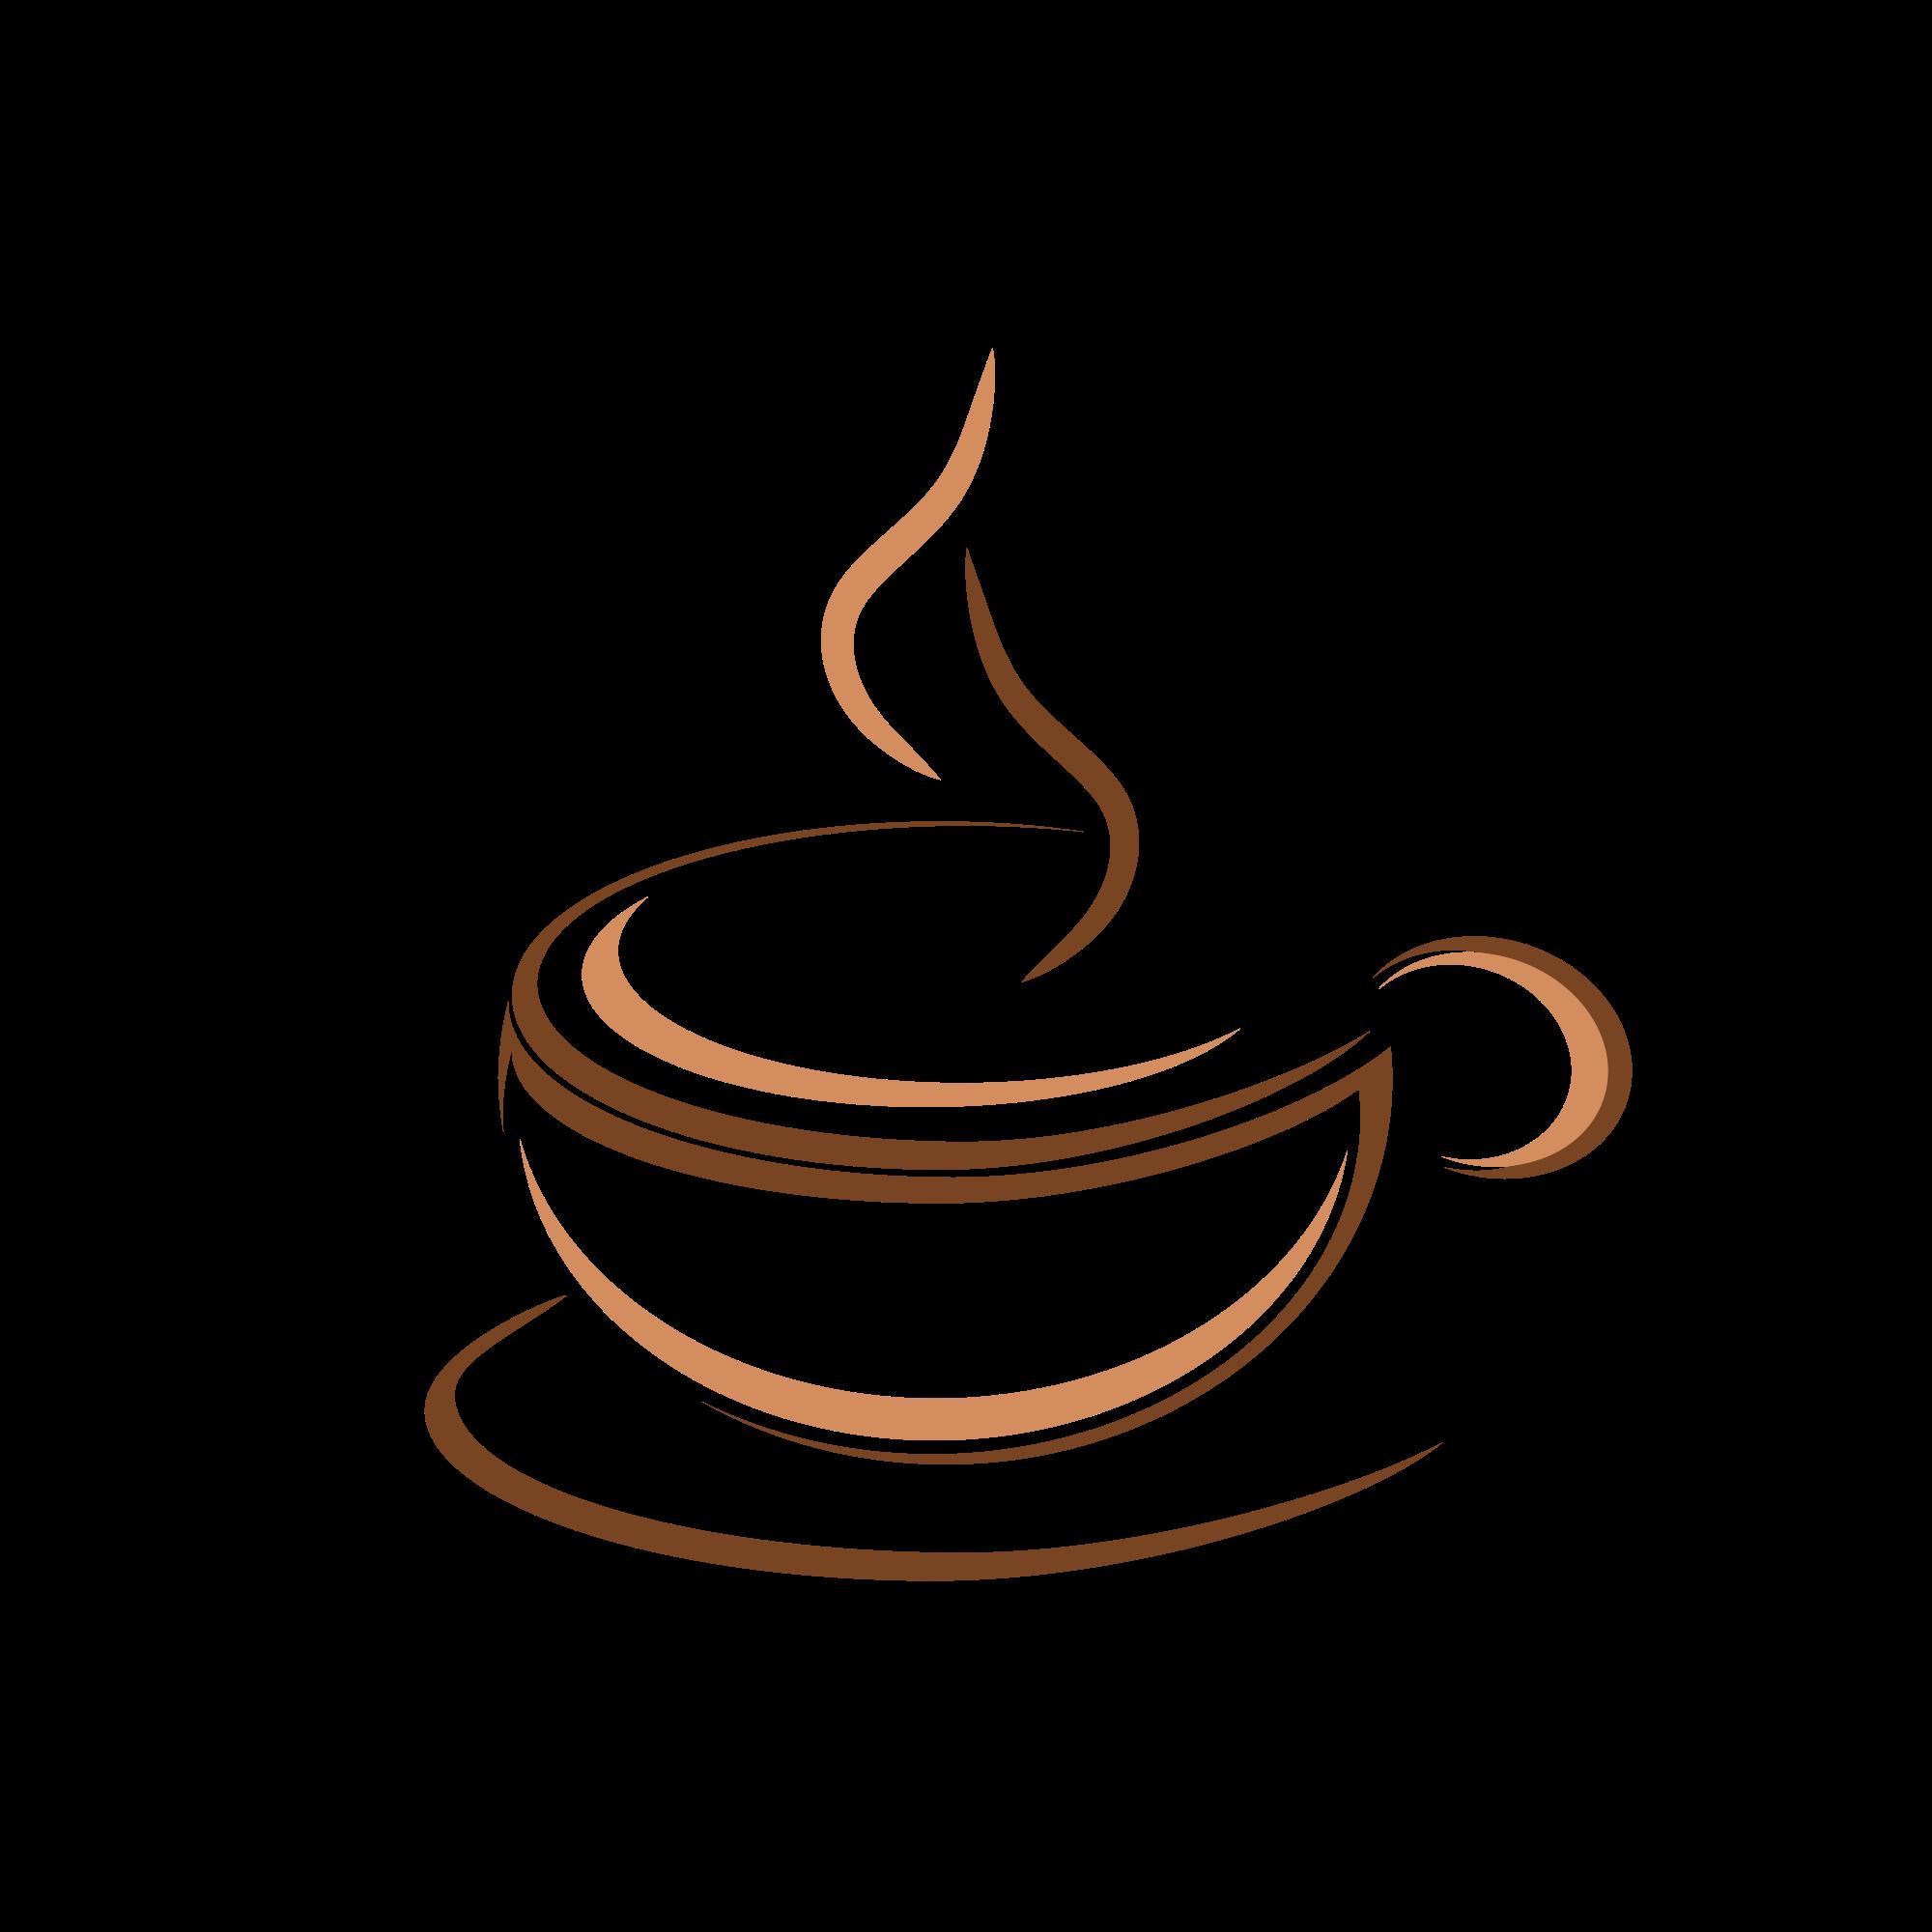 Coffee logo design creative idea logo elements #7502 ...